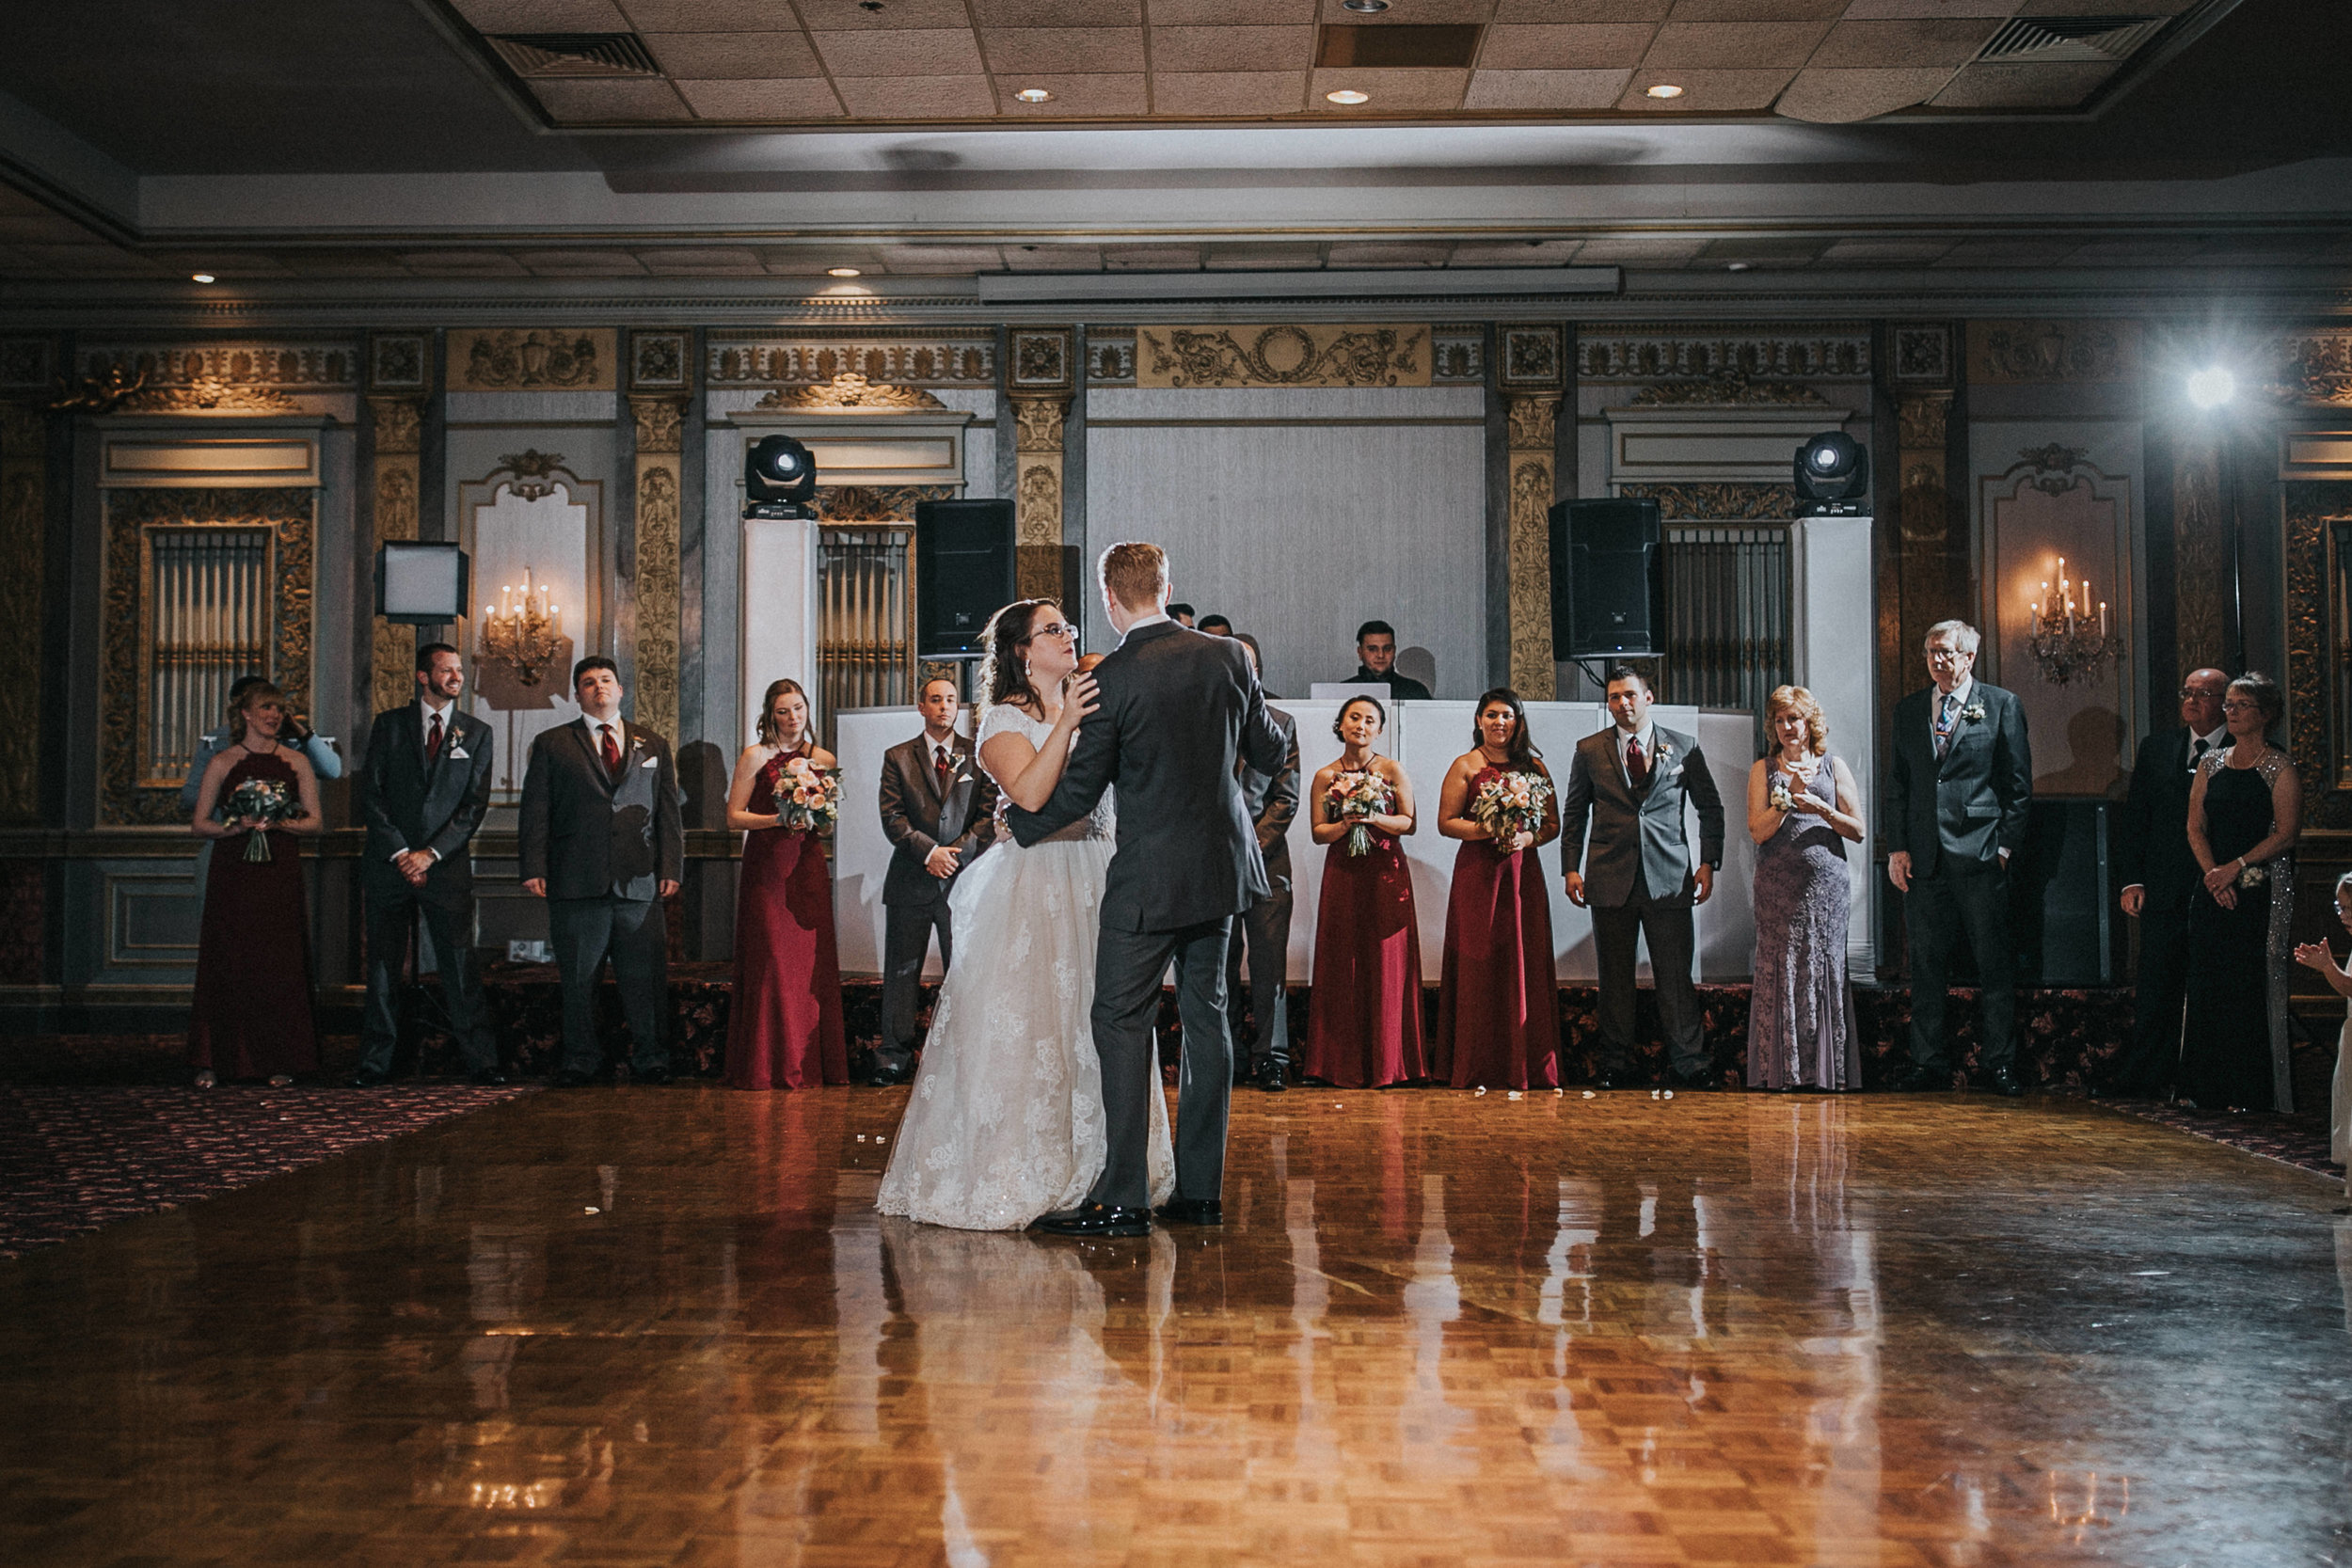 New-Jersey-Wedding-Photography-Fishers-Tudor-House-JennaLynnPhotography-Reception-Kathleen&Eddie-99.jpg